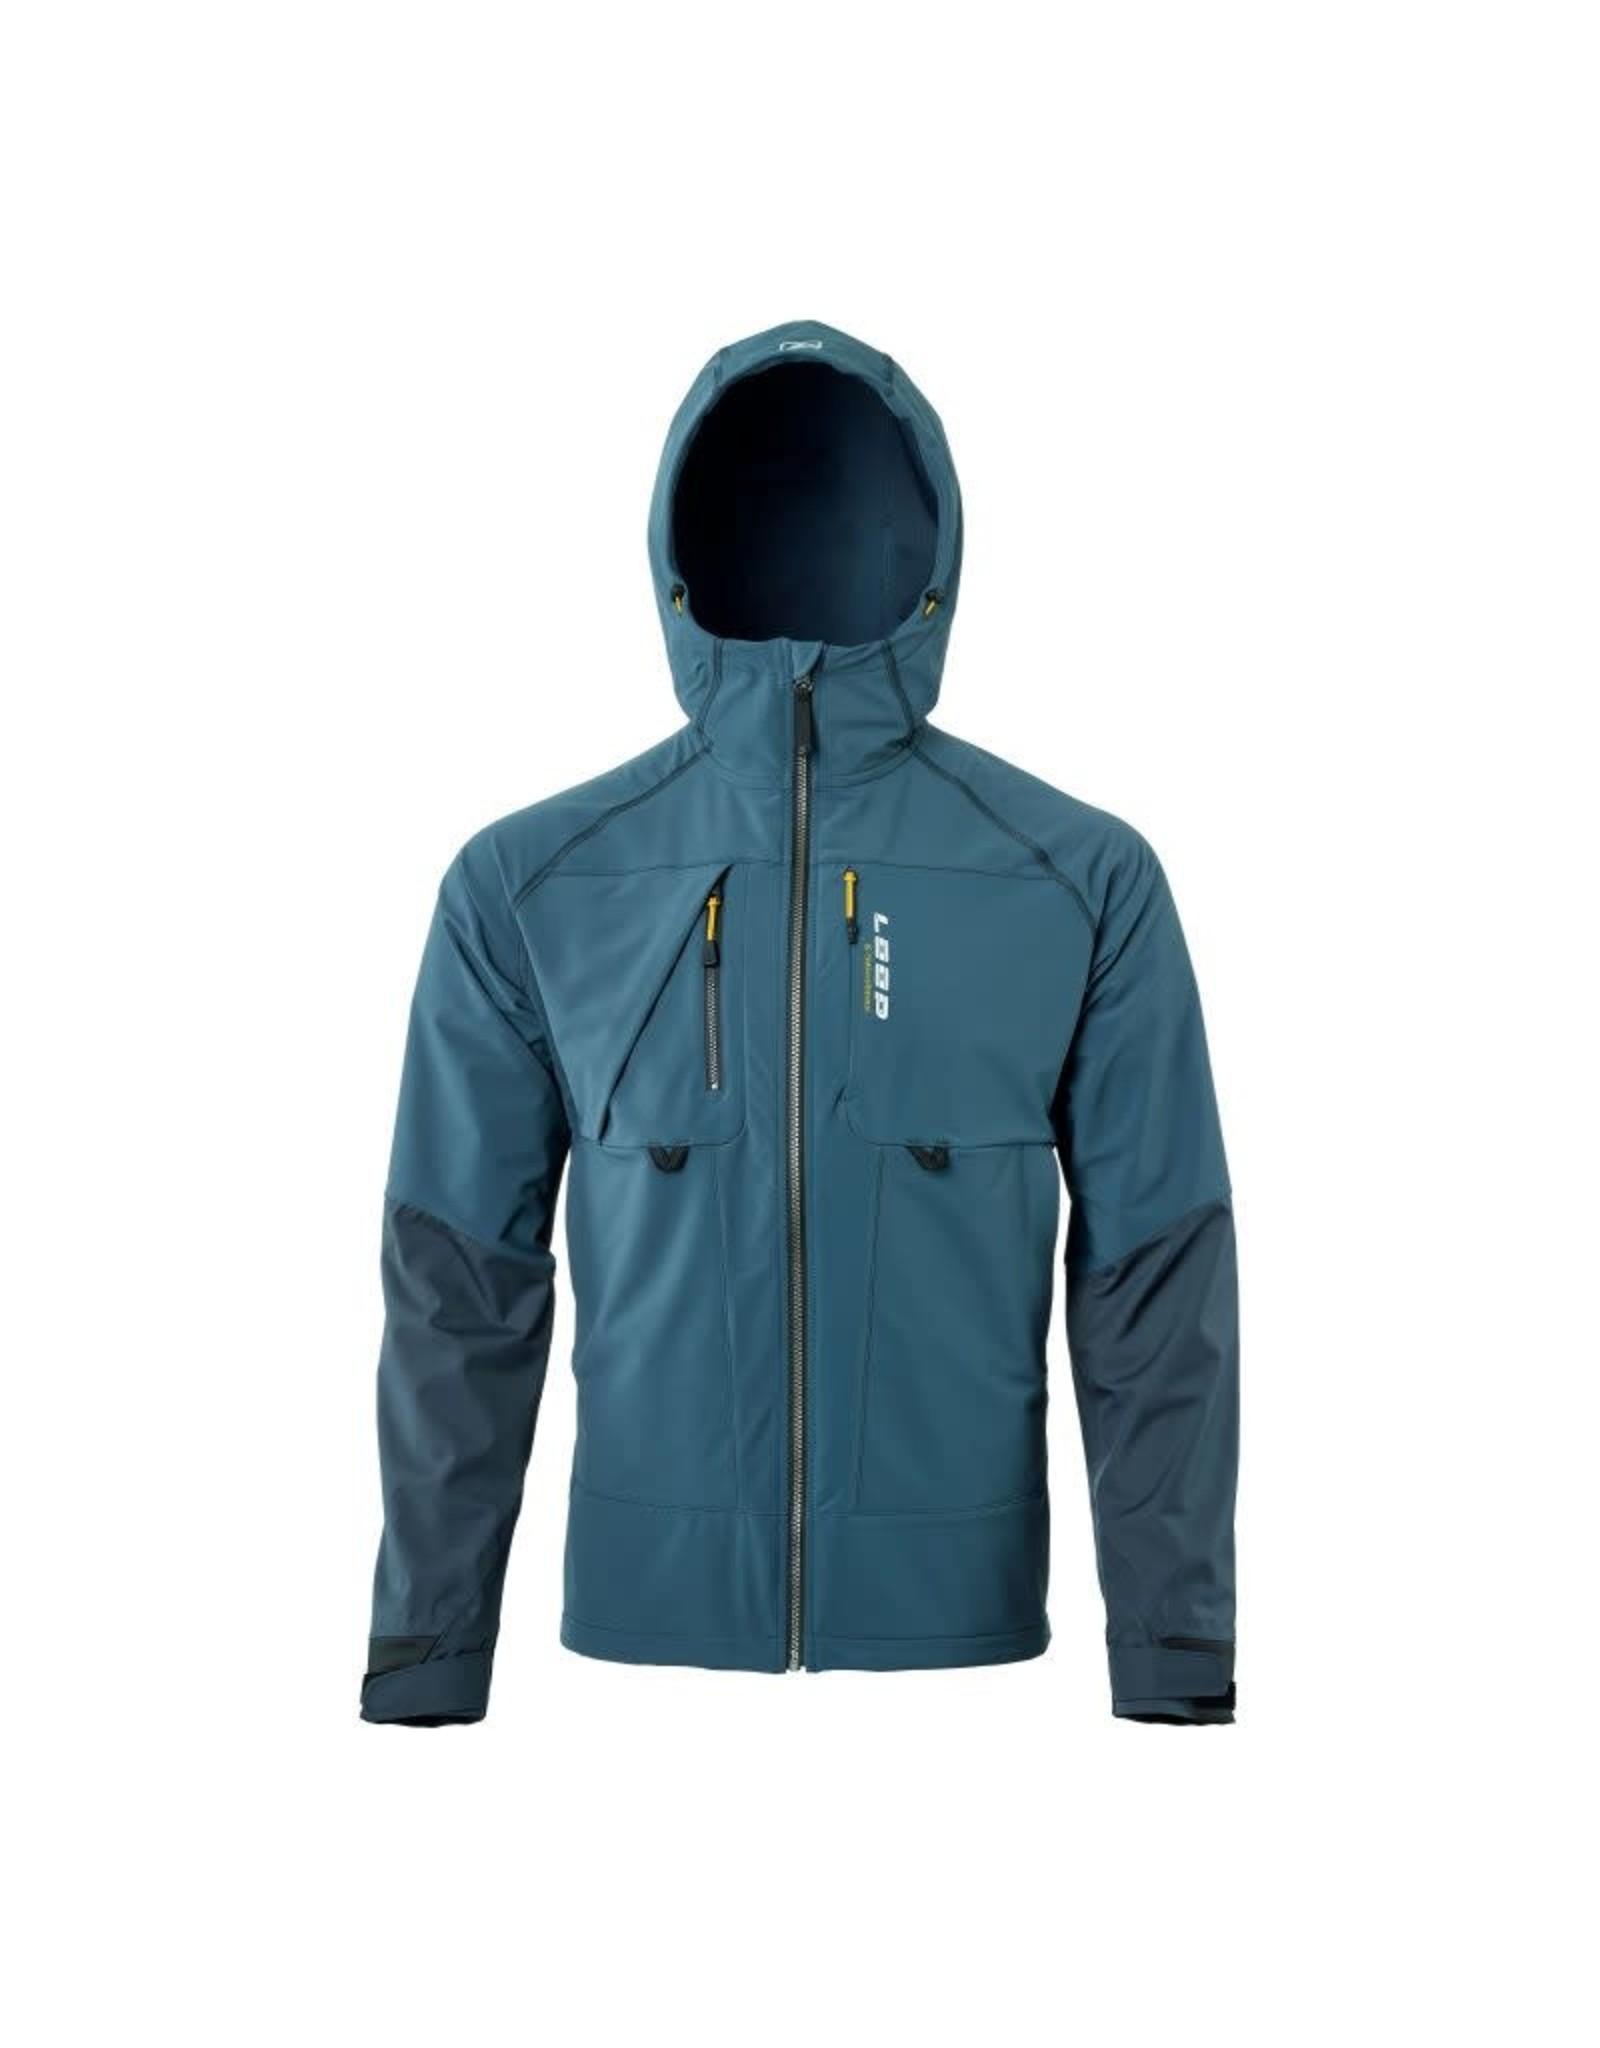 LOOP Stalo Soft Shell Pro Jacket - Dark Slate